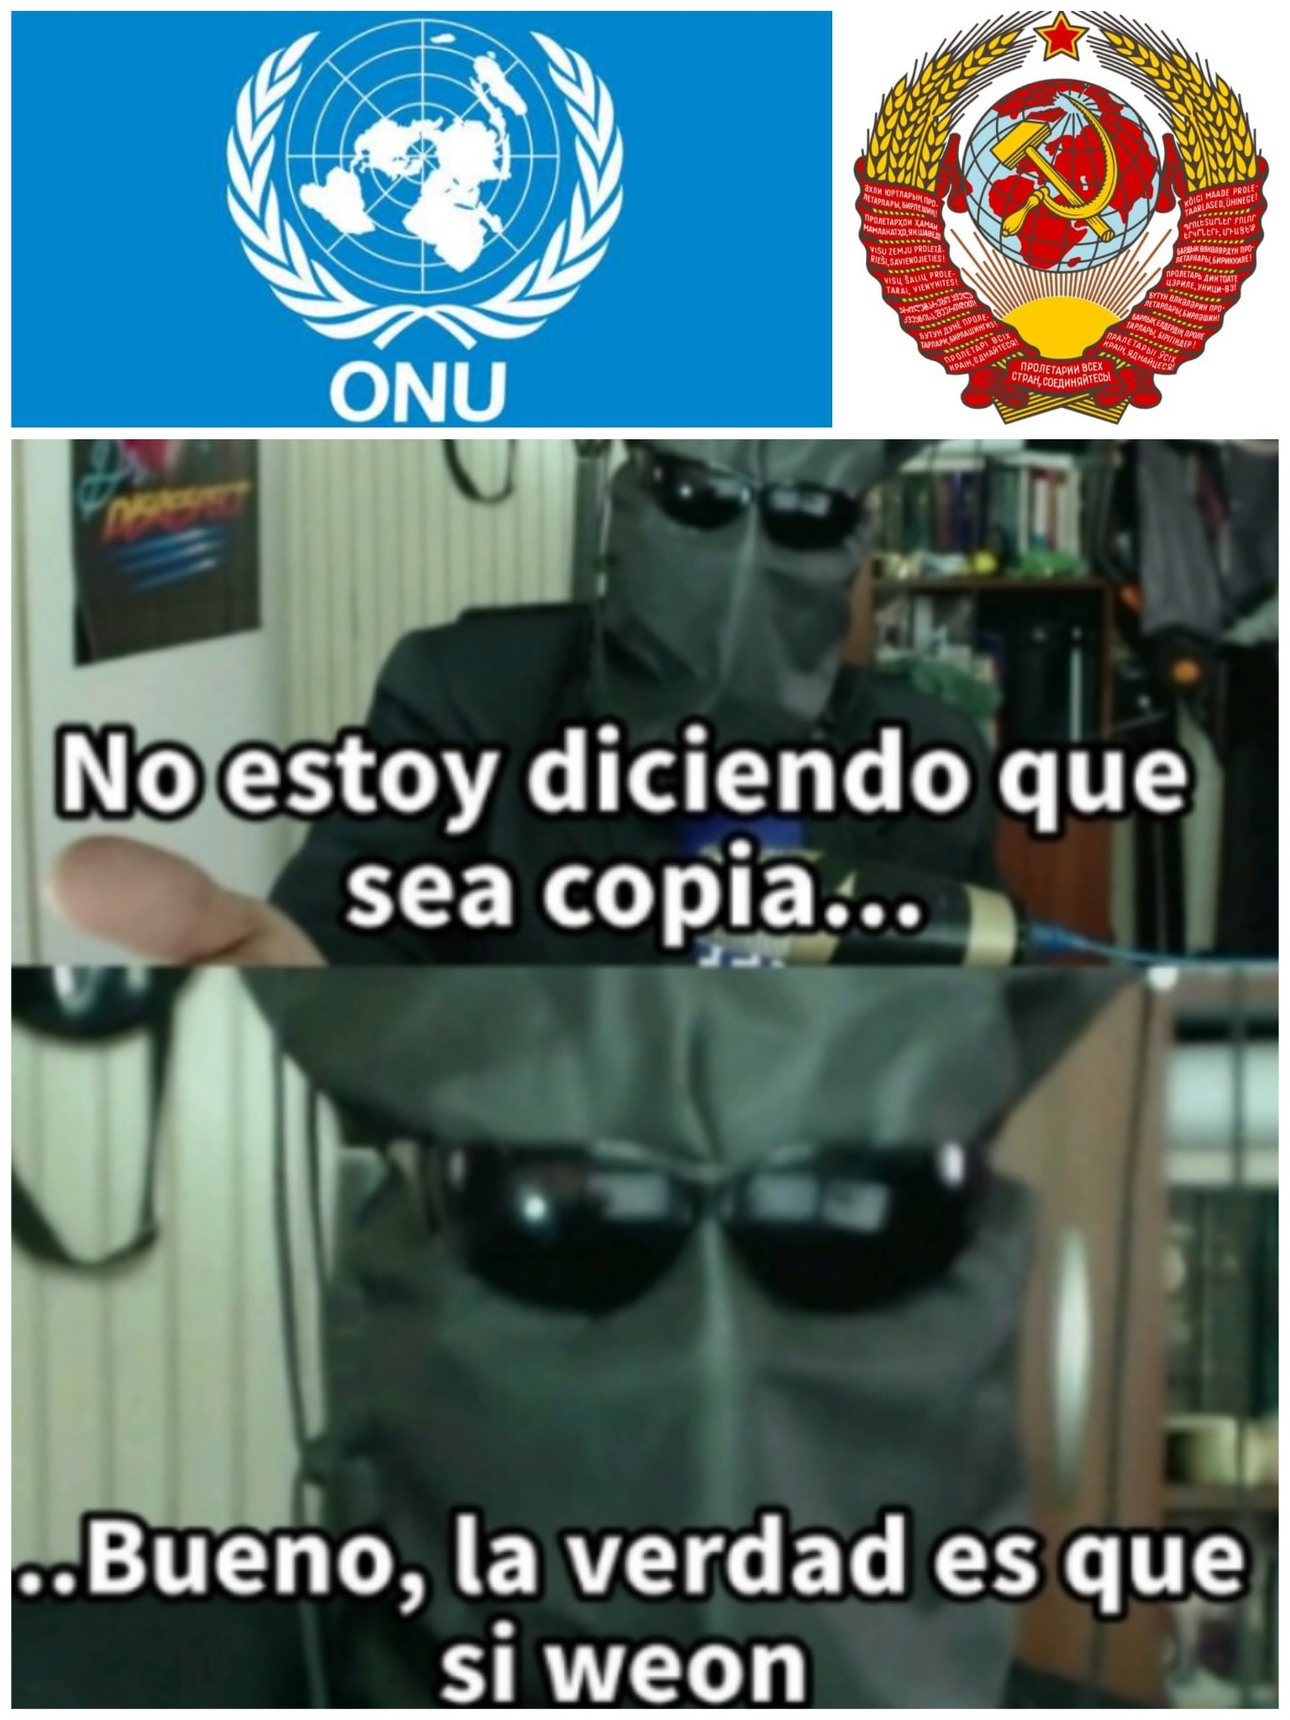 La ONU y la URSS. - meme